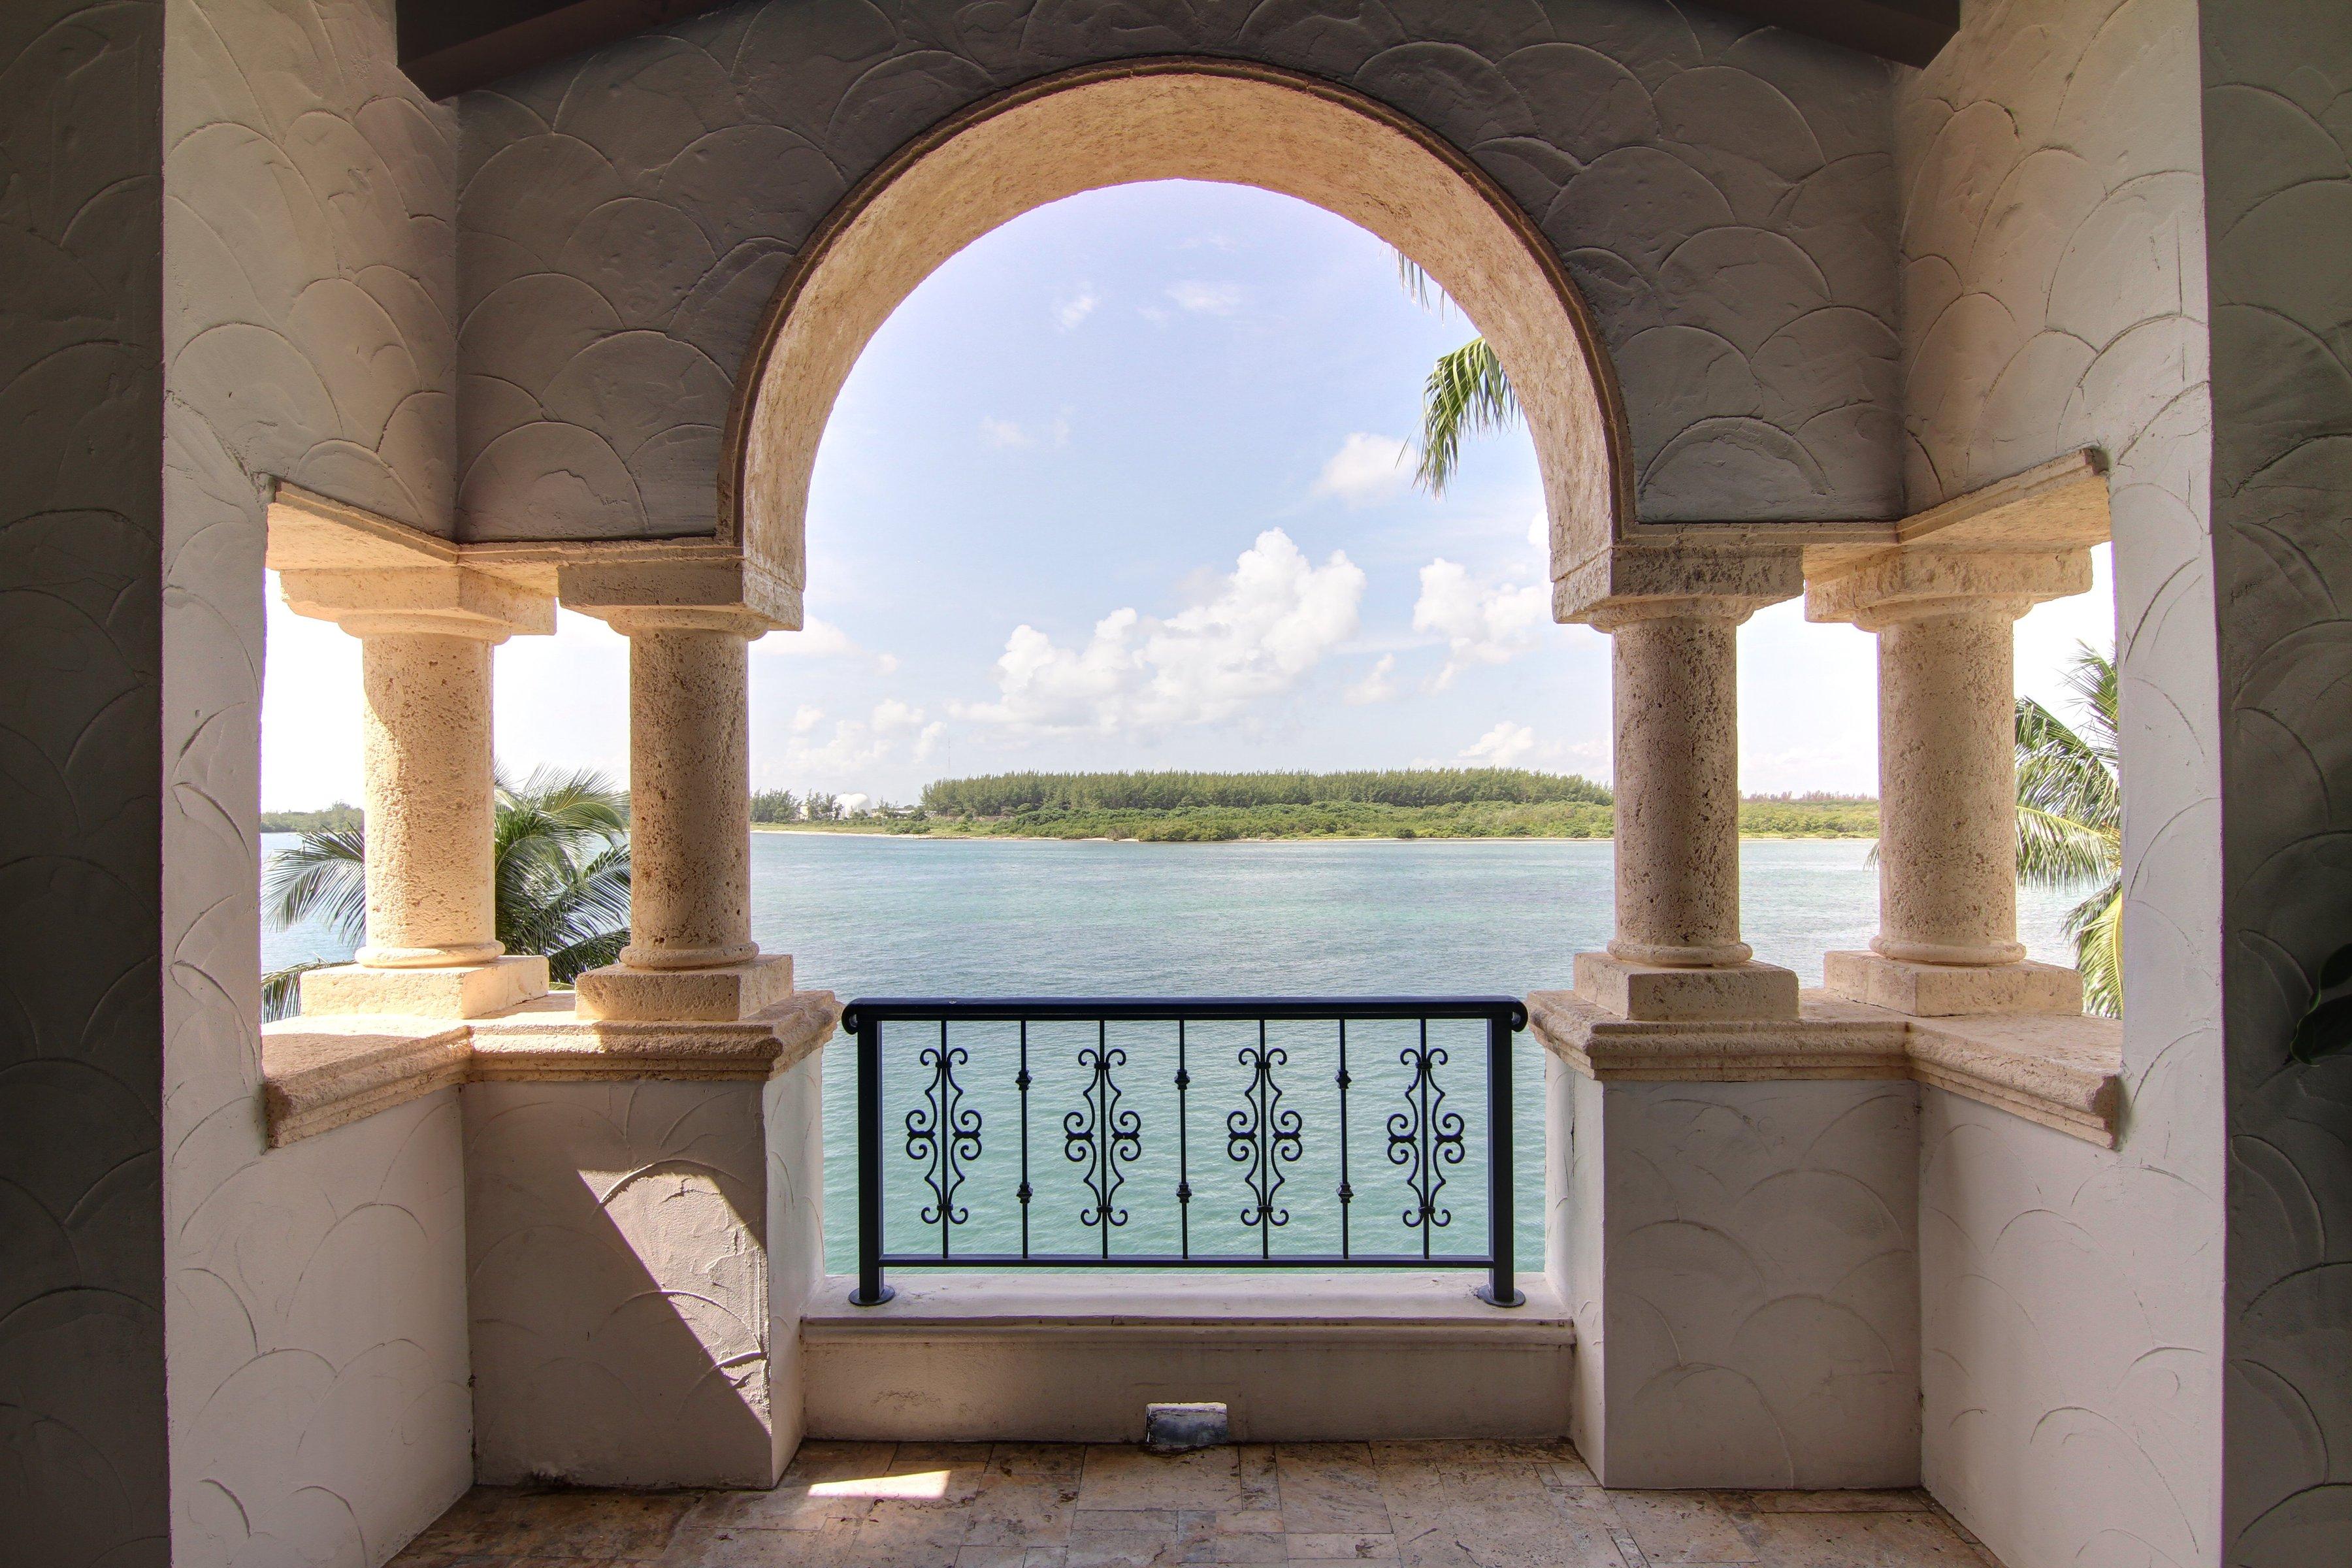 共管物業 為 出售 在 2444 Fisher Island Dr #5404 2444 Fisher Island Dr 5404 Miami Beach, 佛羅里達州, 33109 美國